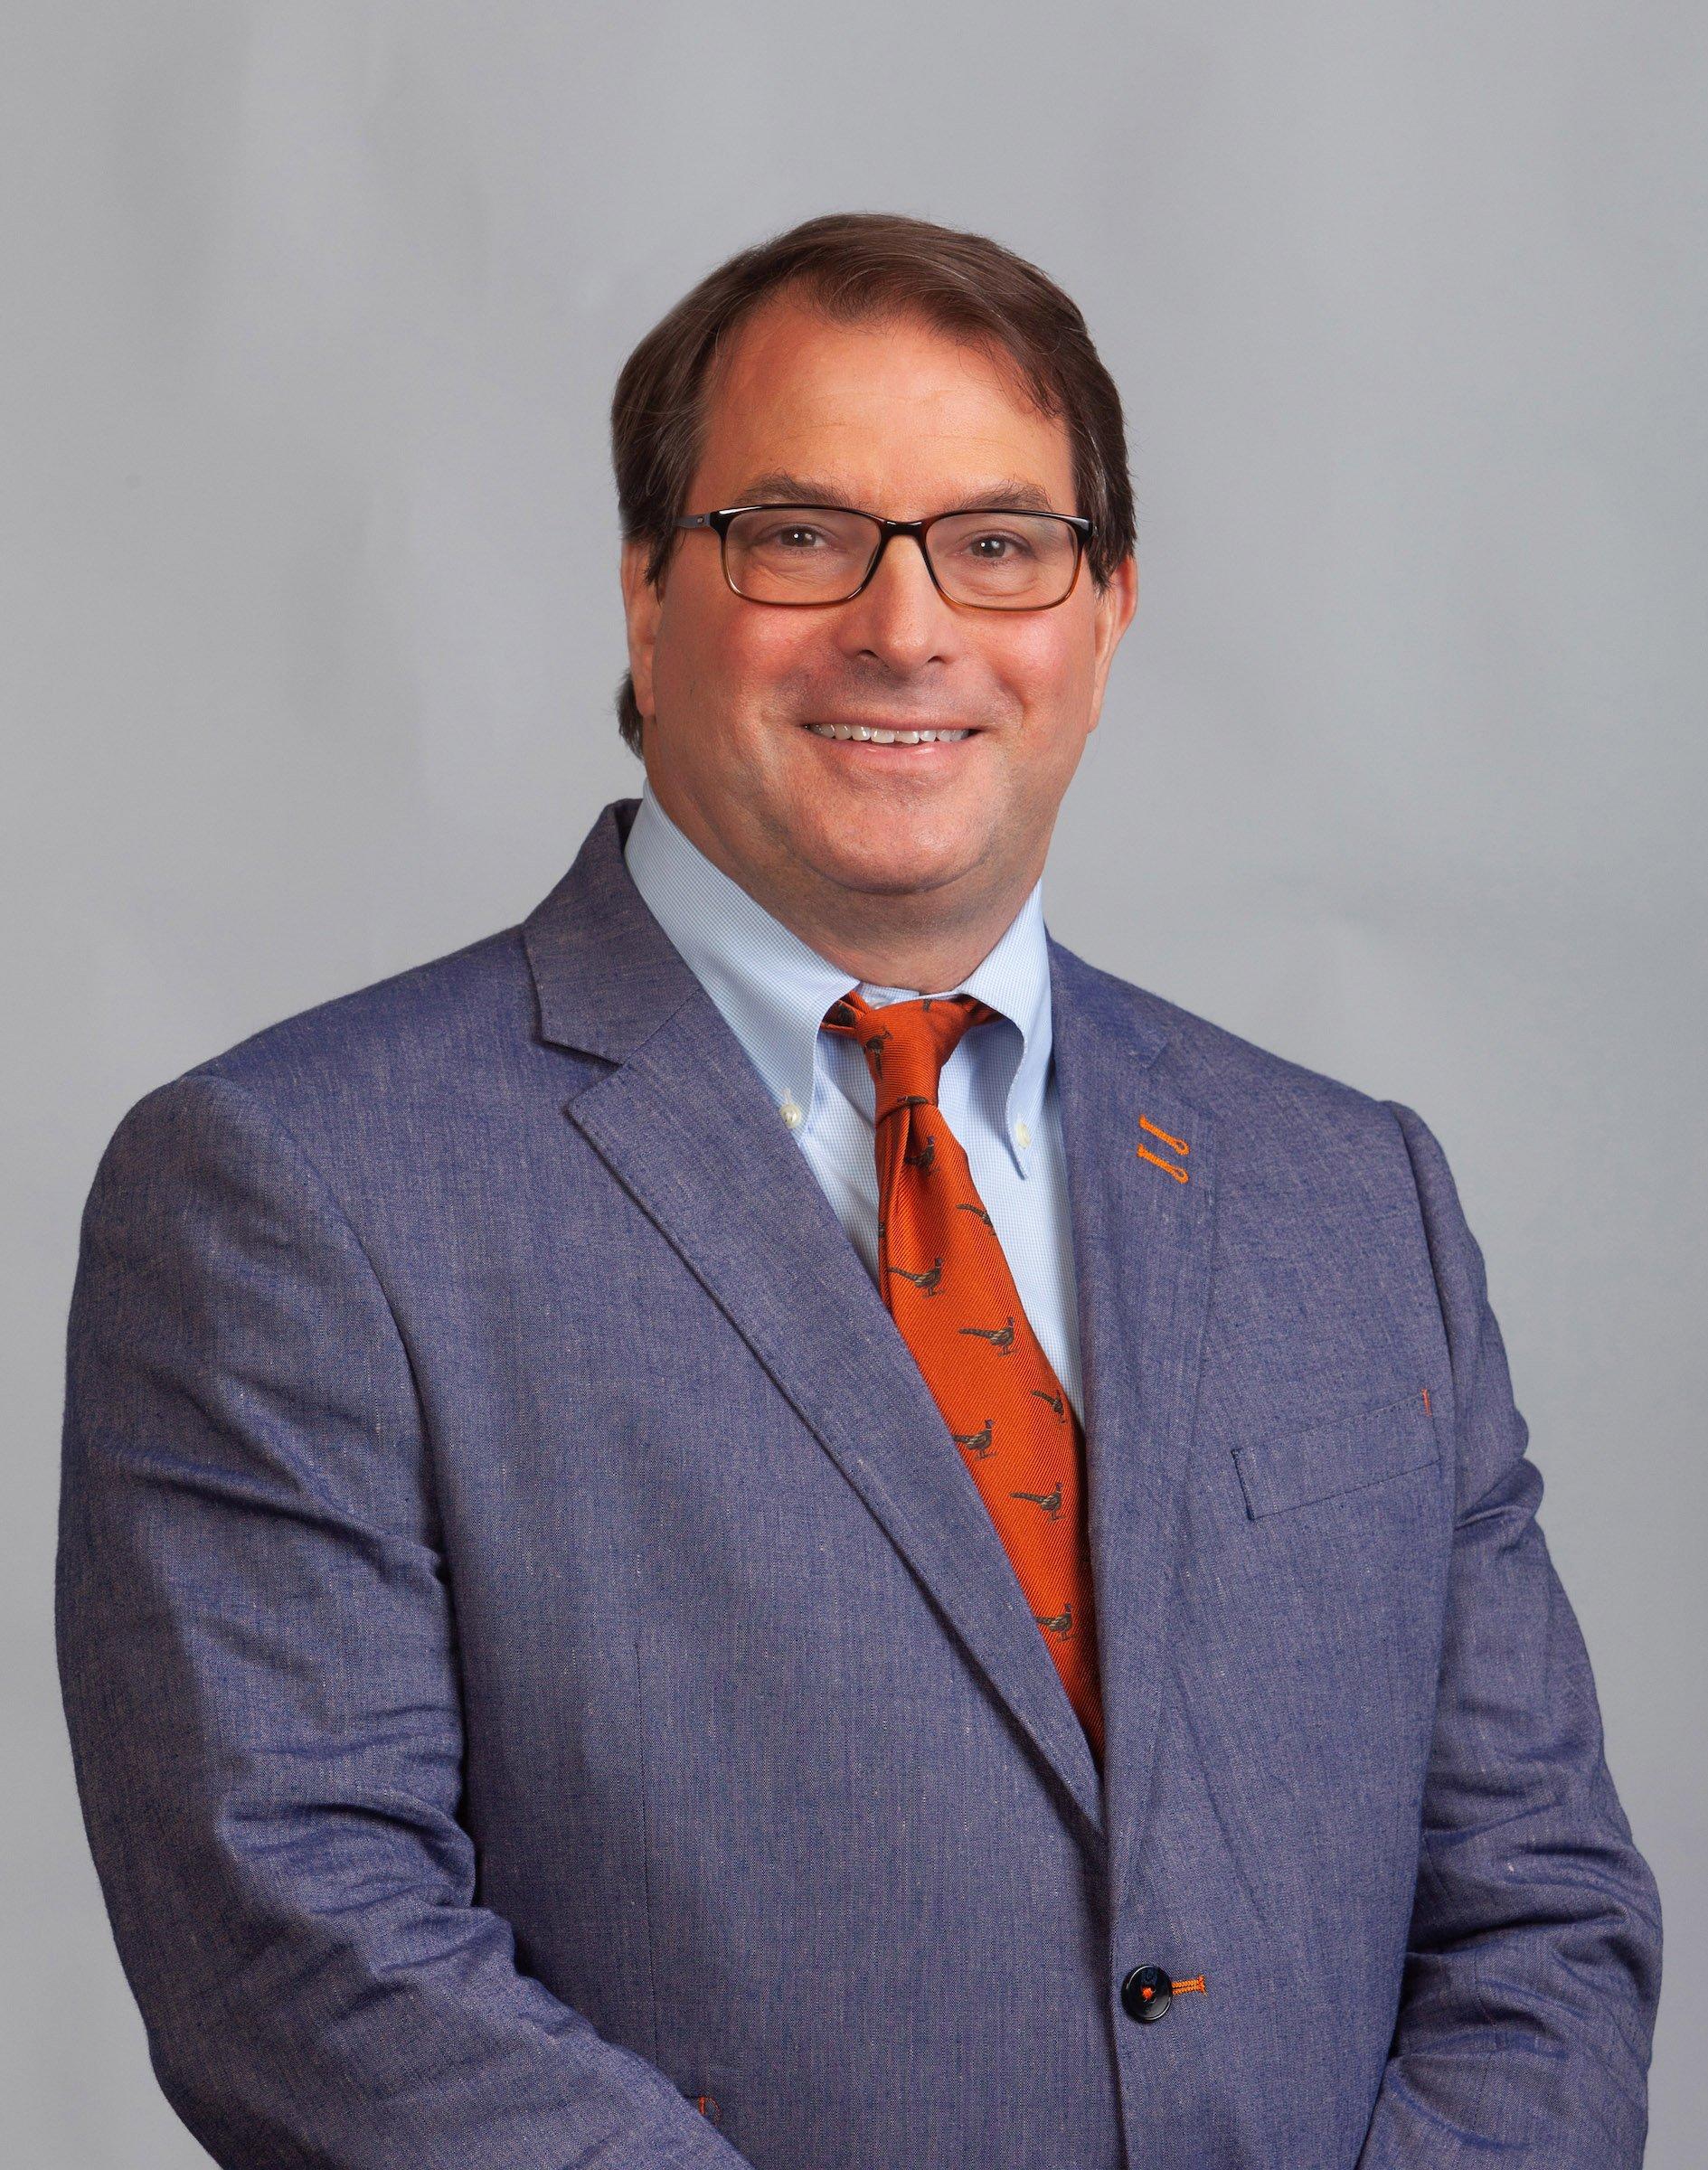 Ben J. Kirbo, M.D.